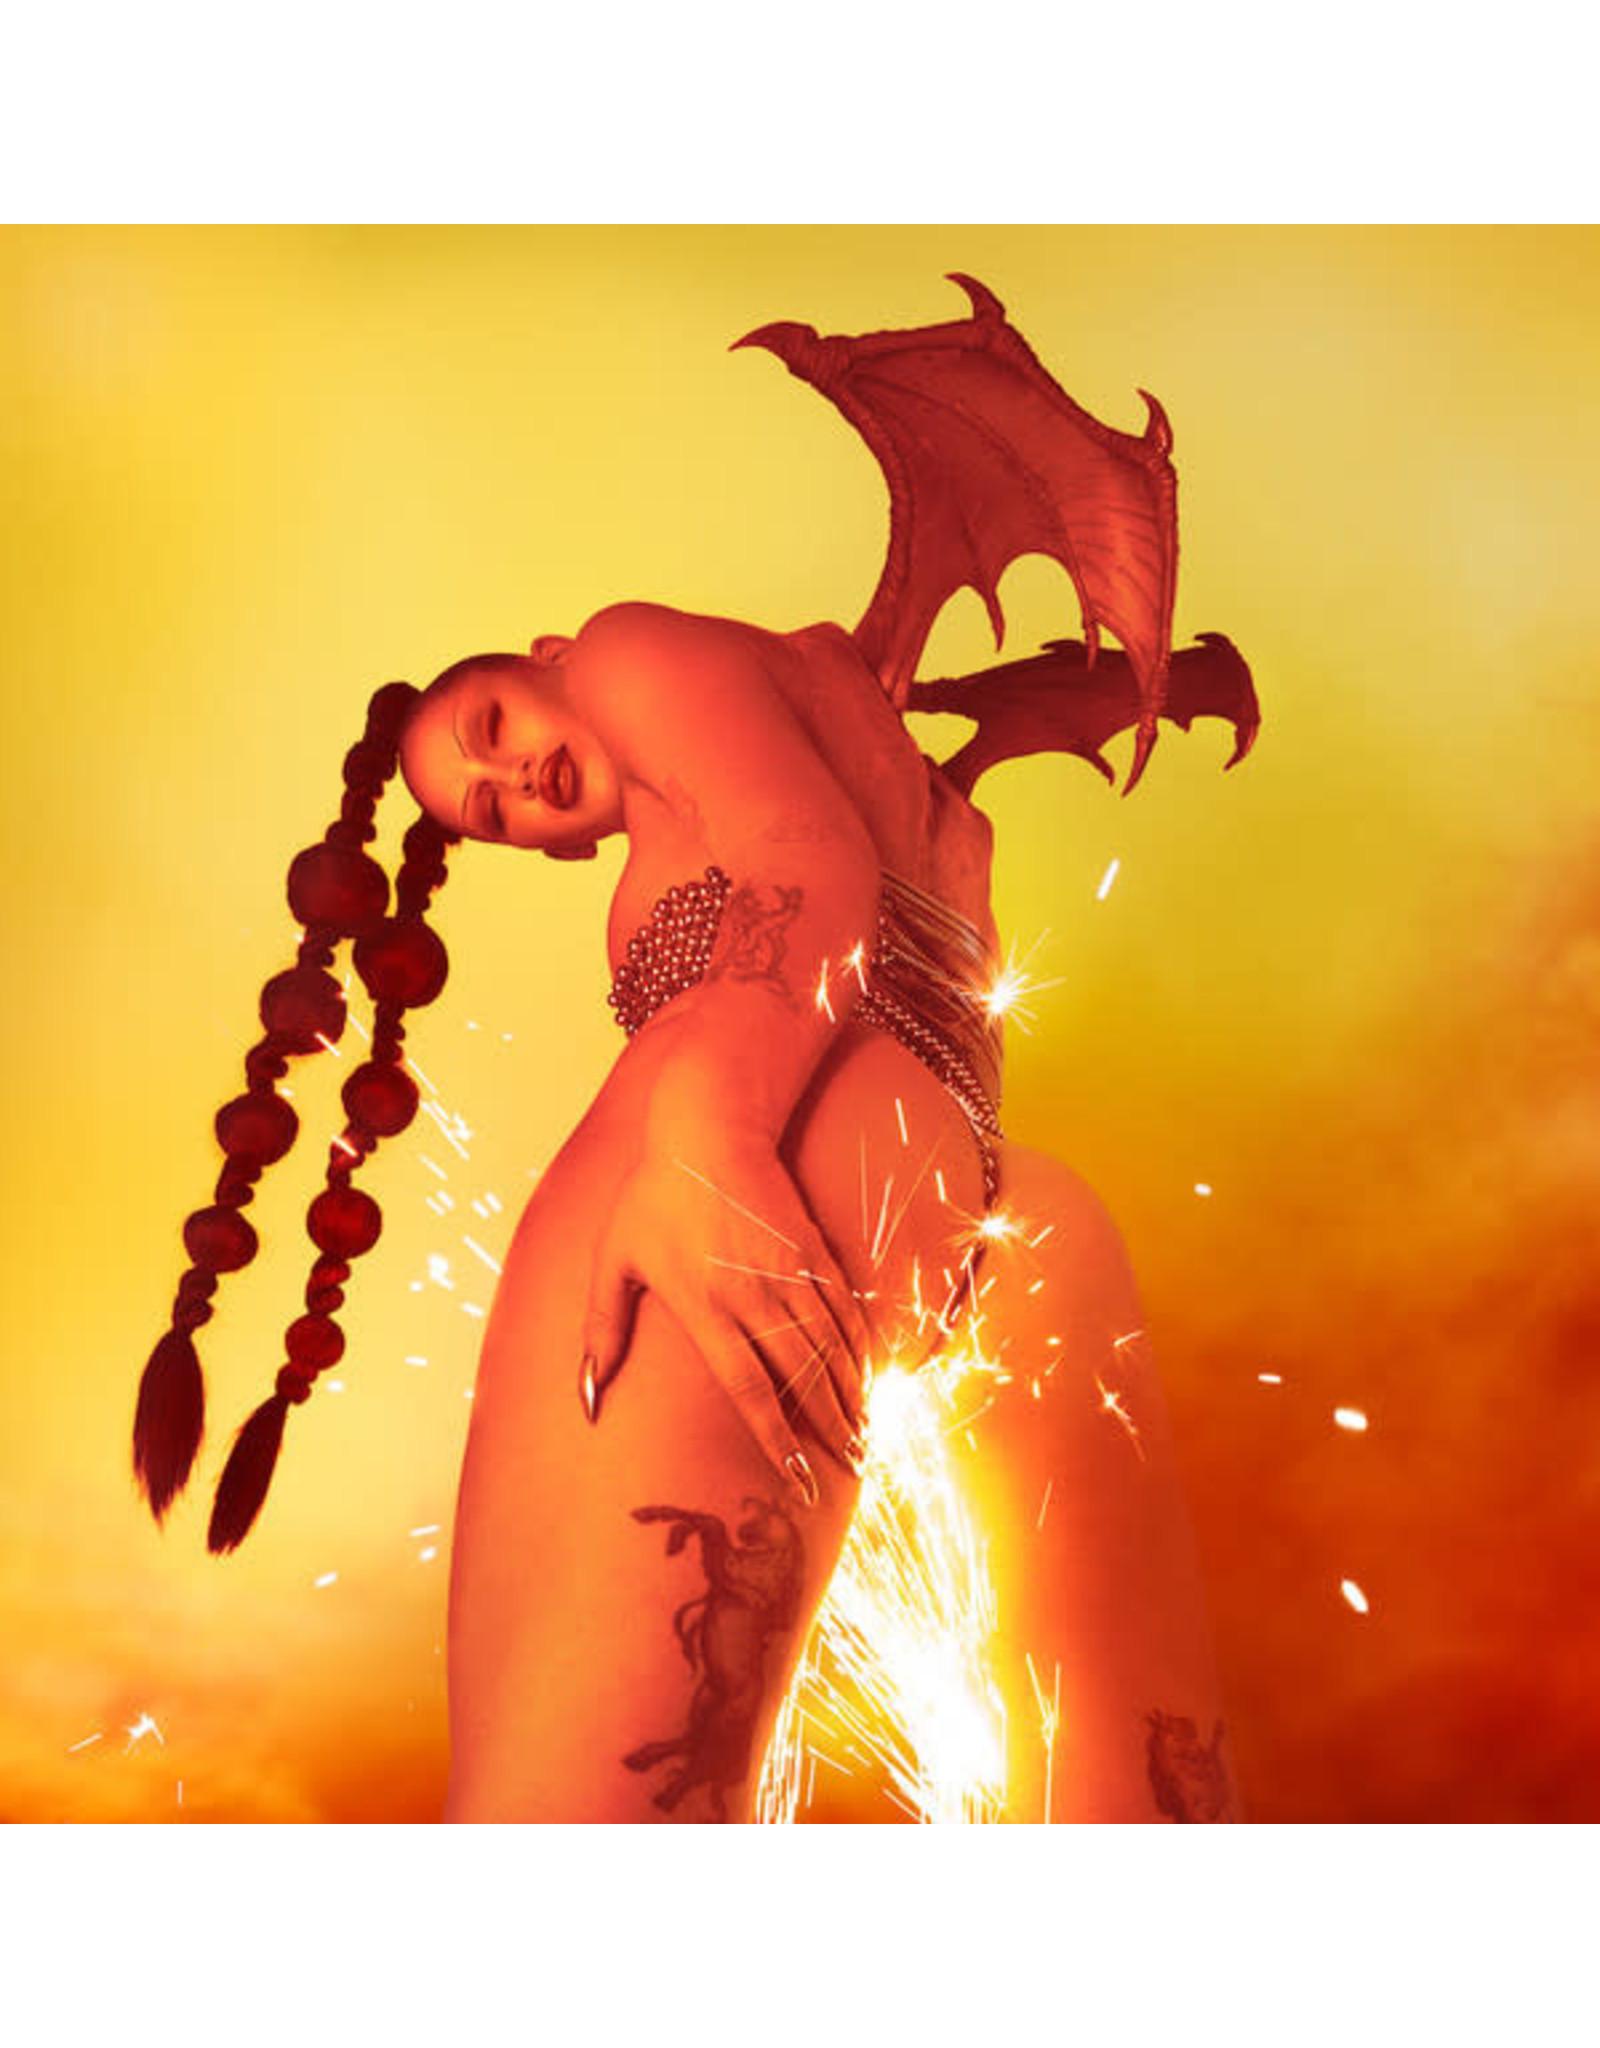 Eartheater - Phoenix: Flames Are Dew Upon My Skin  LP